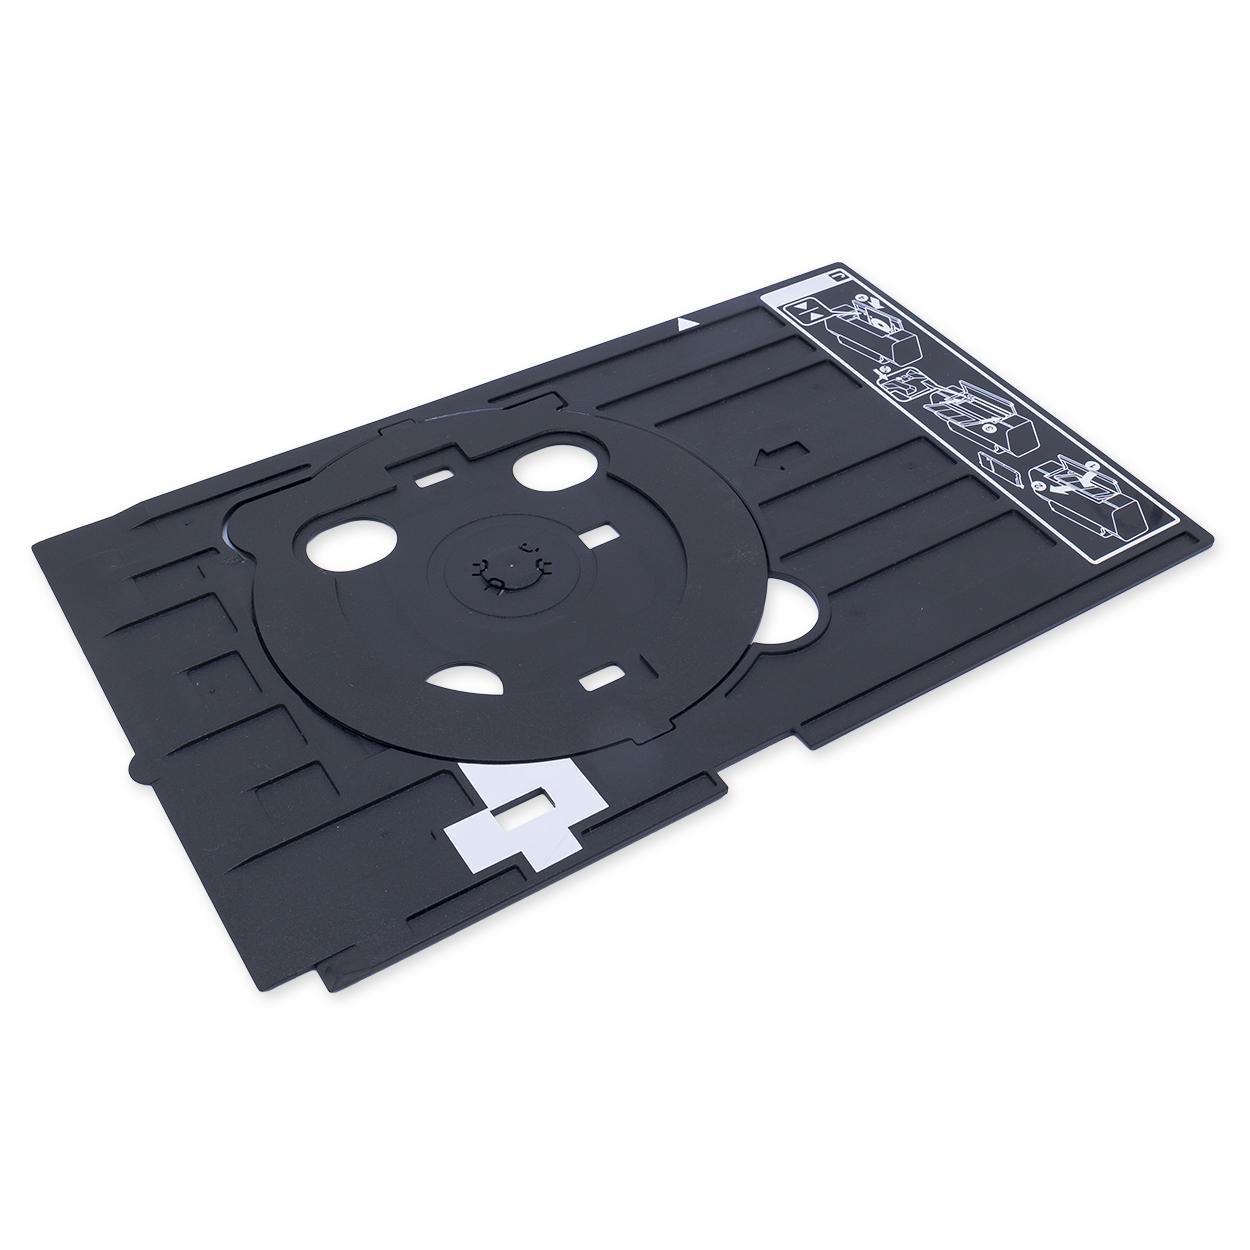 Bandeja Original Epson de Mídias CD/DVD - Modelos: T50, L800, L805, R260, R270, R280, R290, T60 e Artisan 50